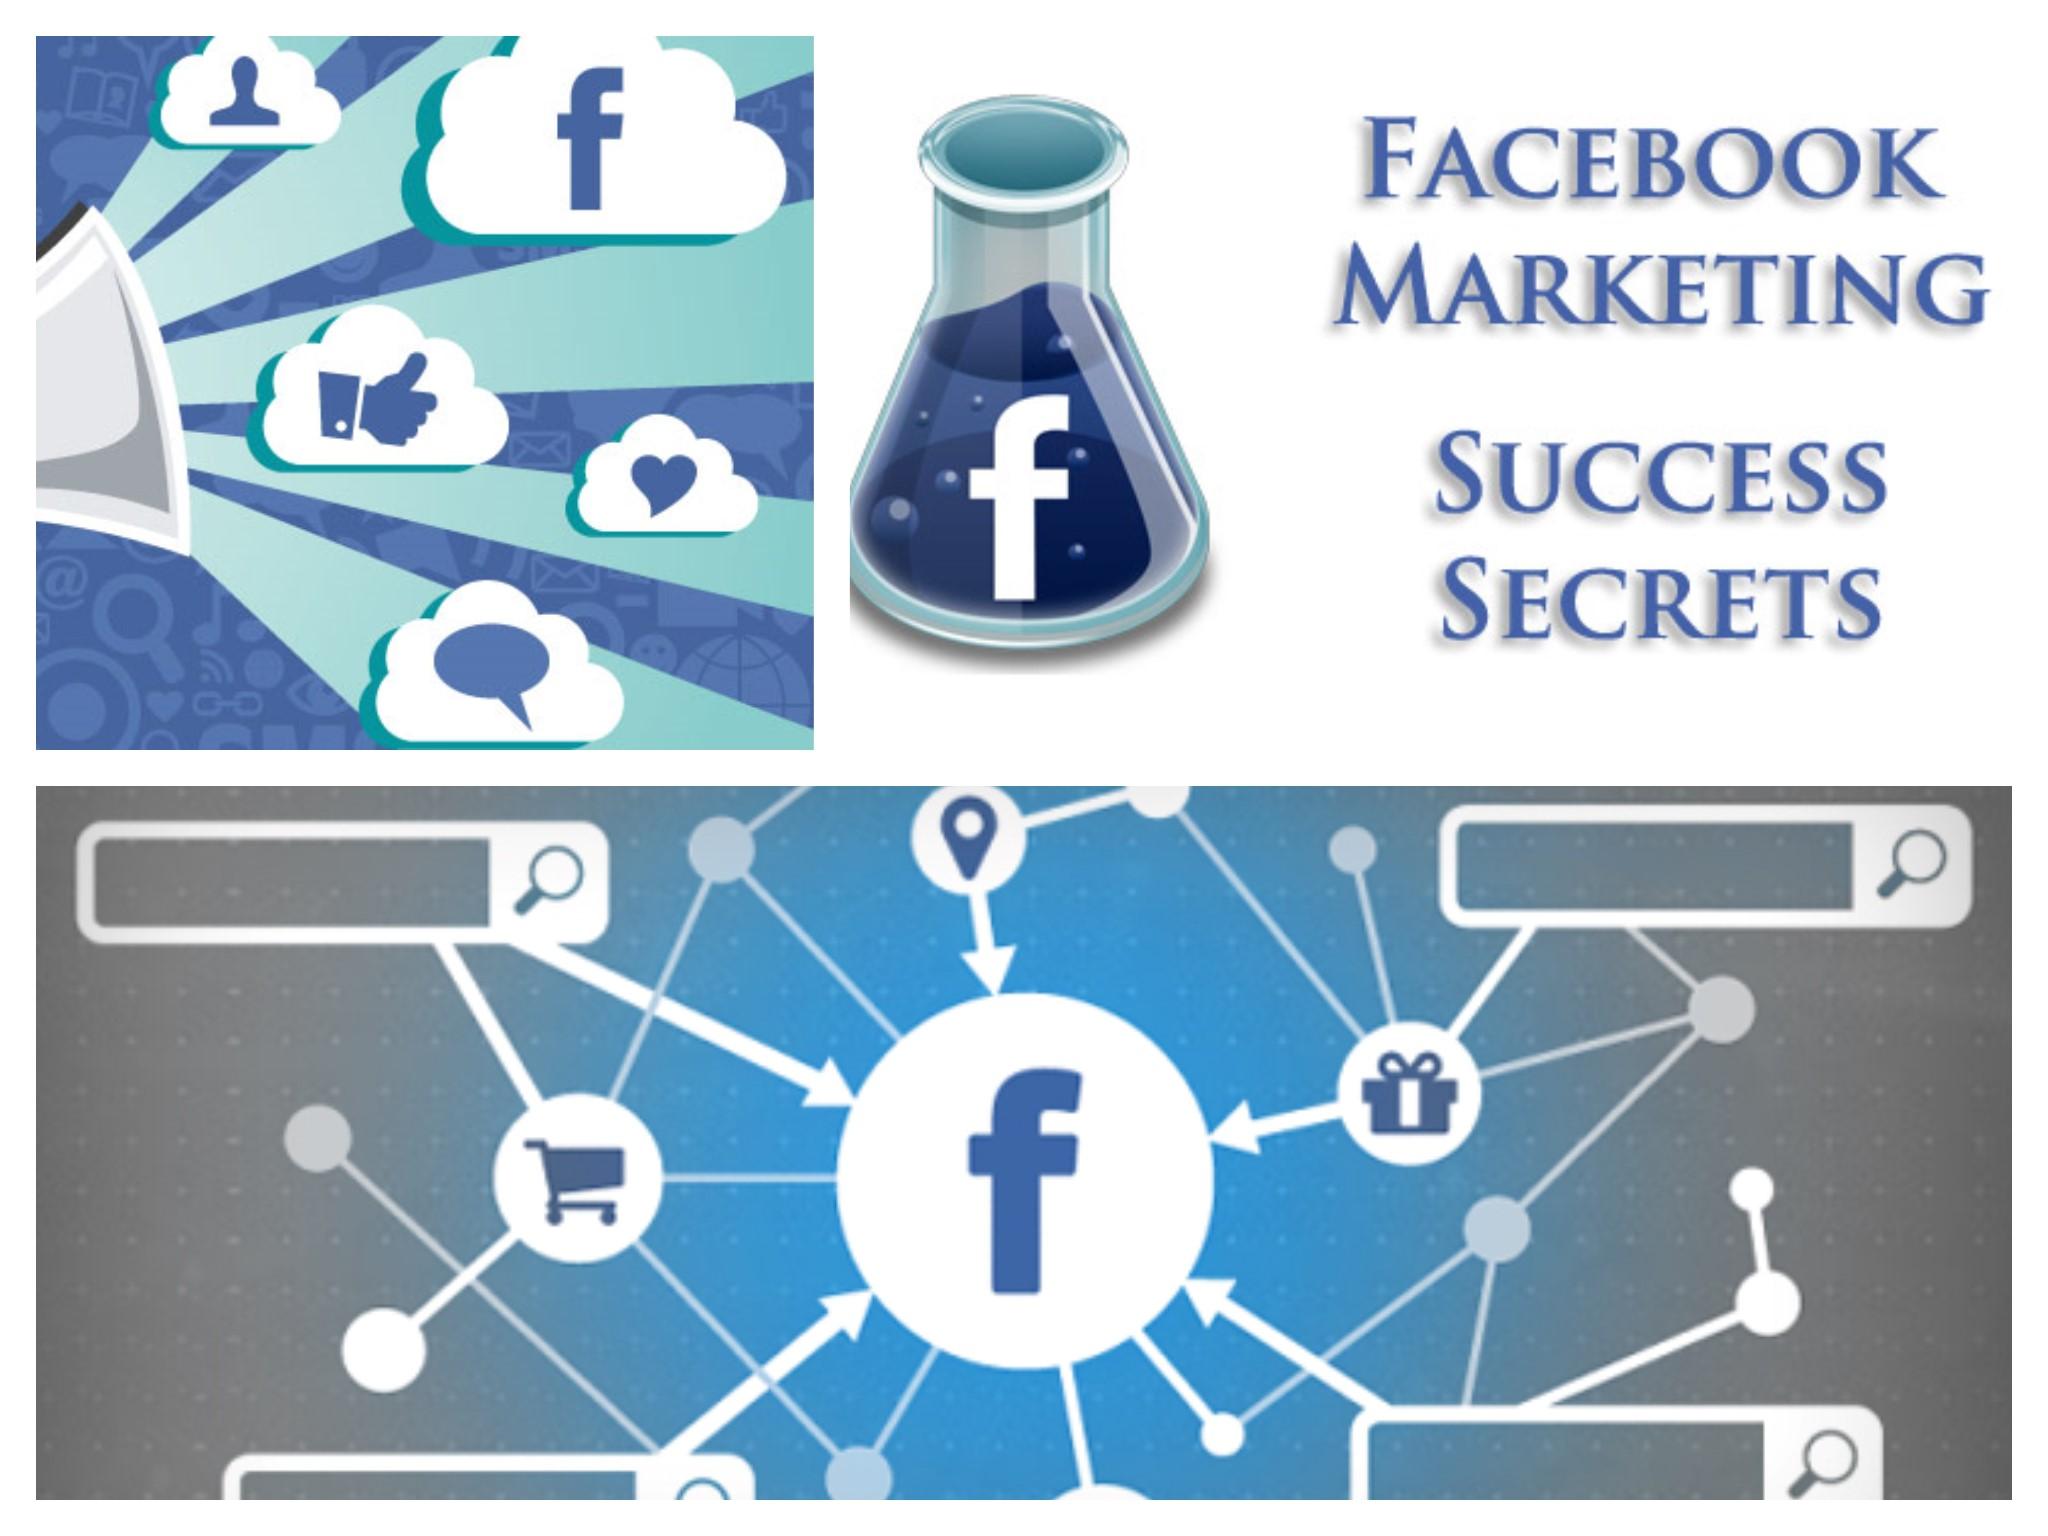 Facebook Marketing Success Secrets